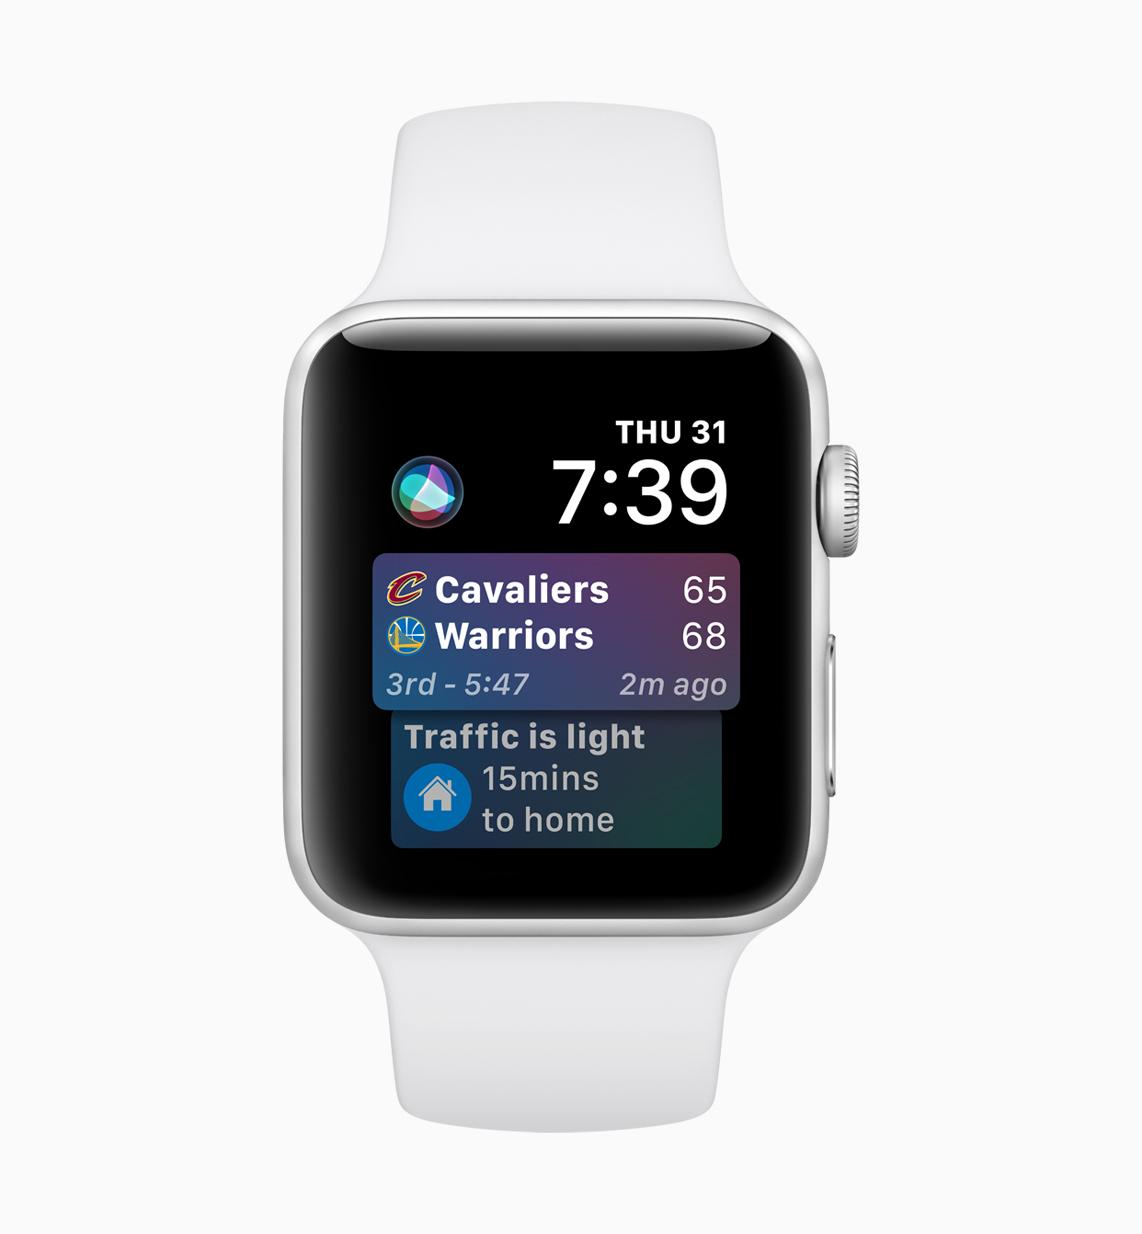 Apple-watchOS_5-Siri-Face-02-screen-06042018.jpg